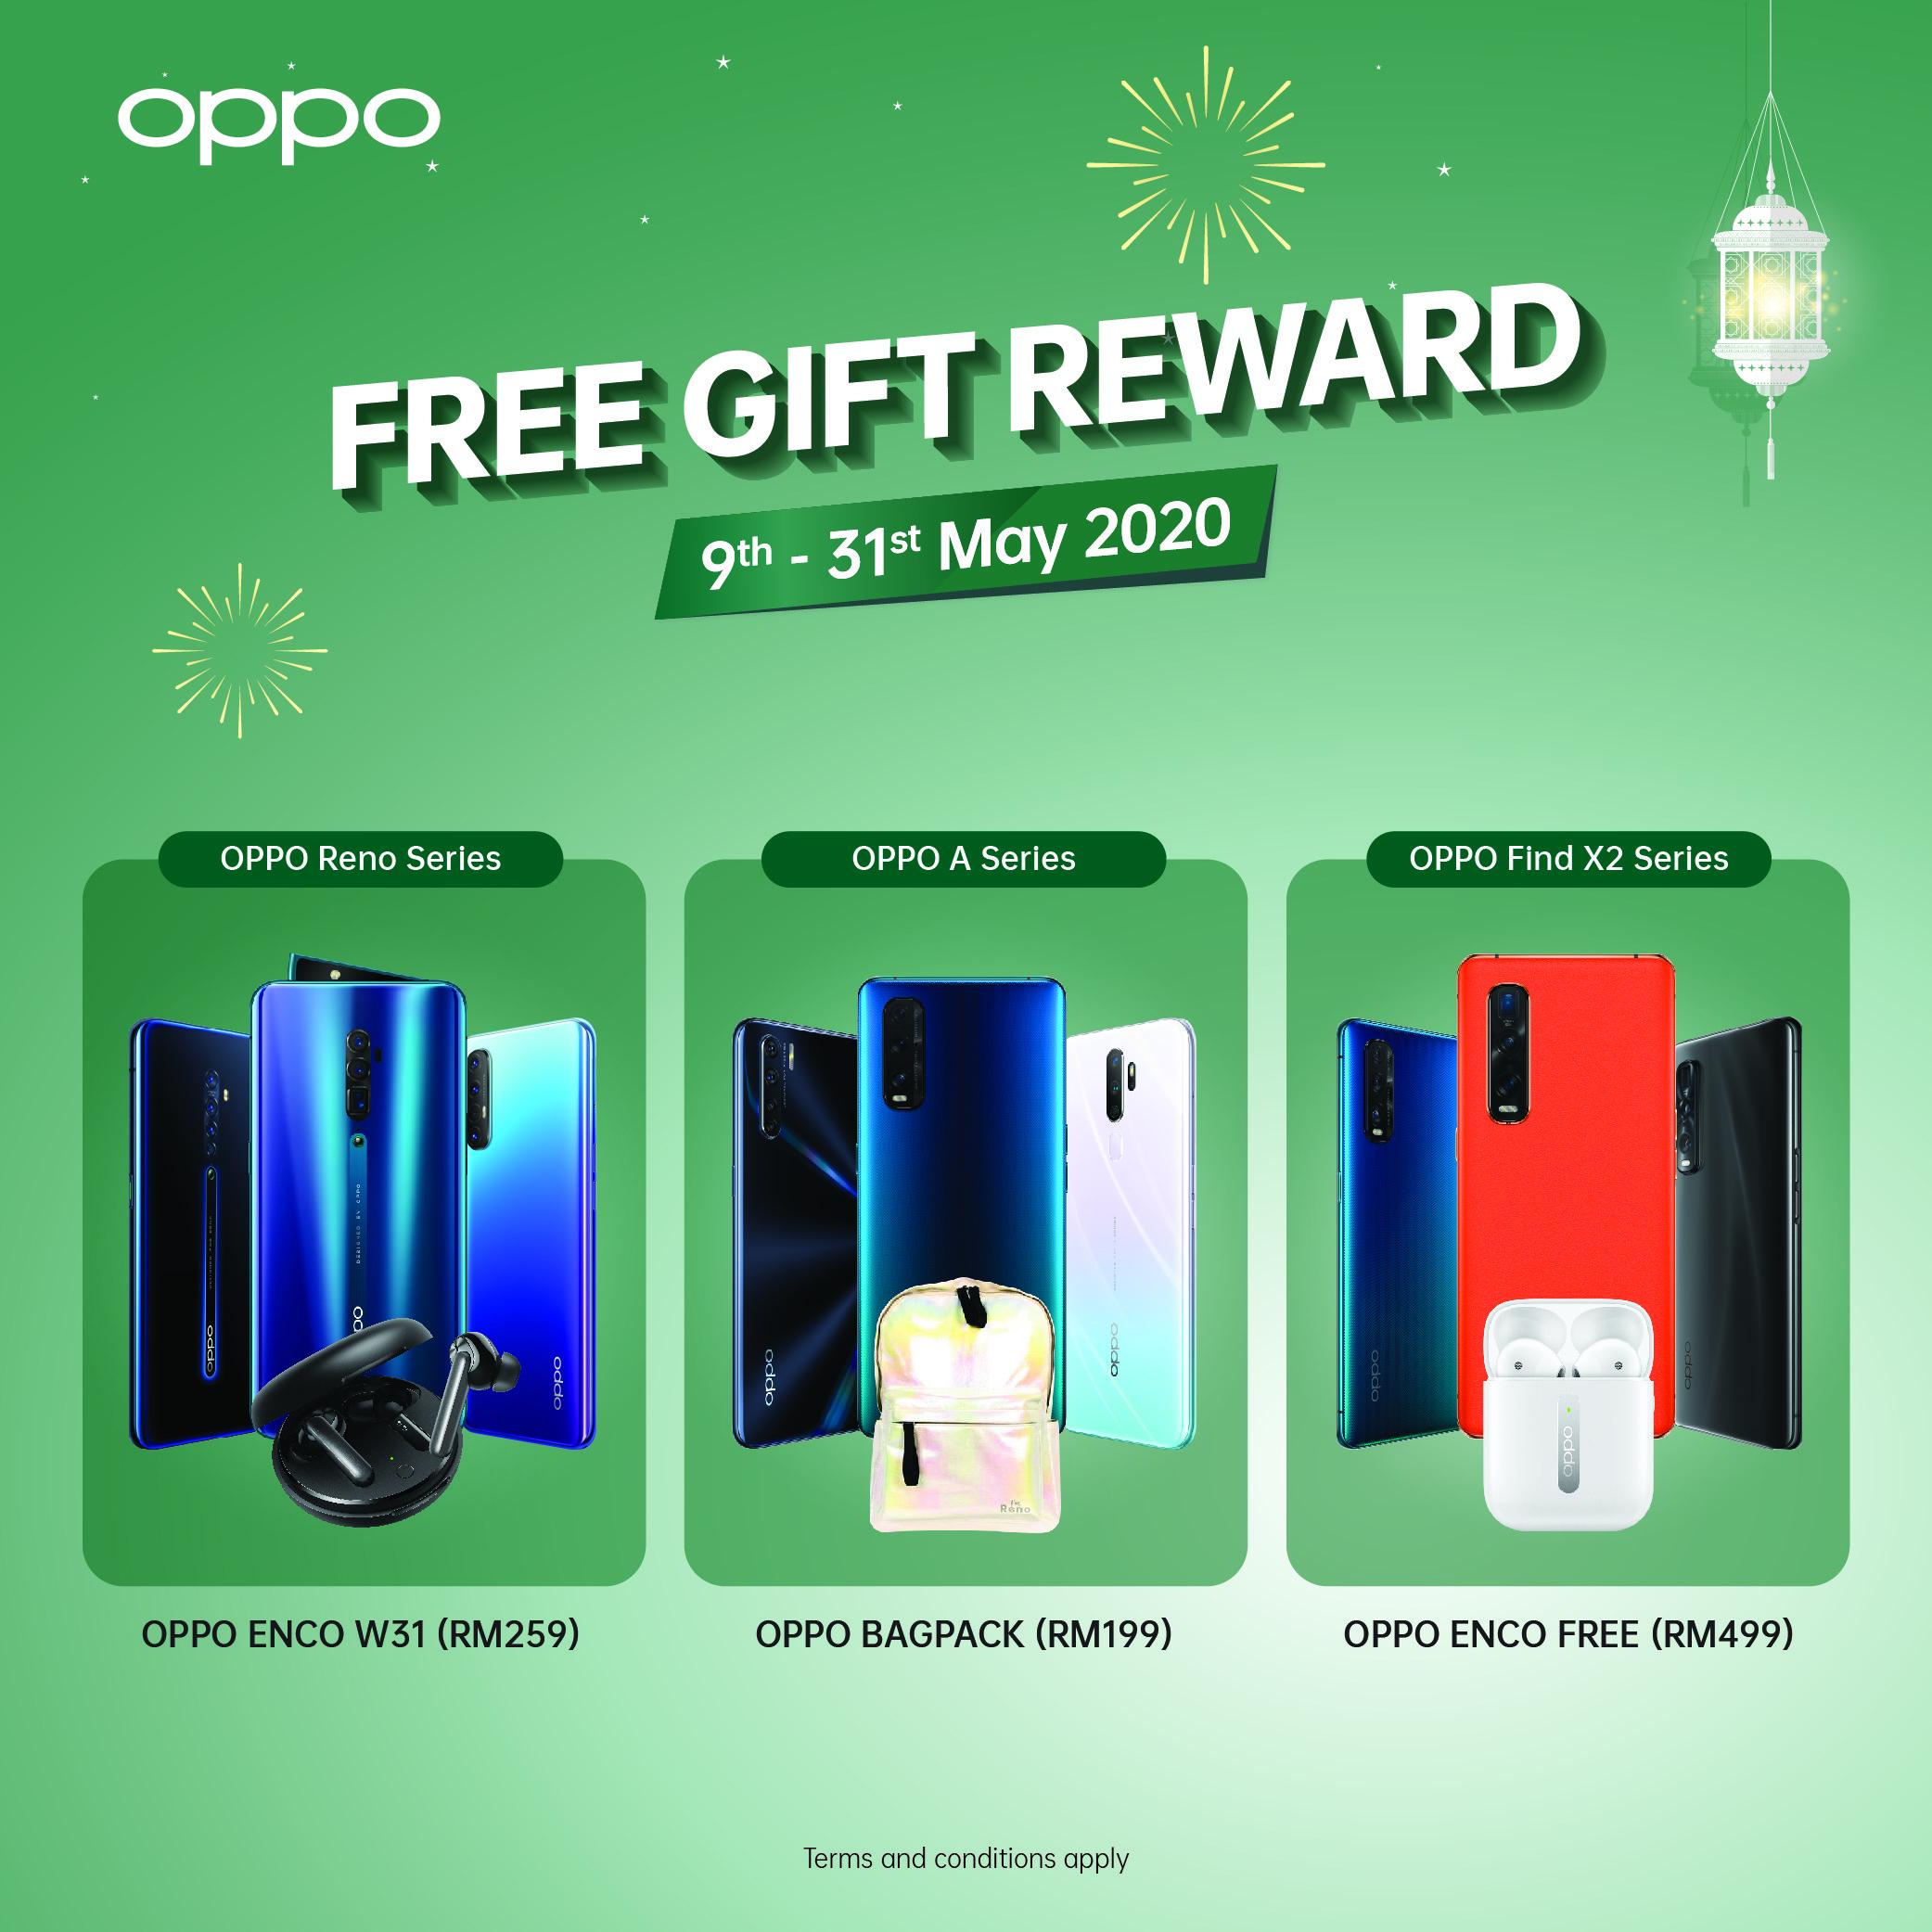 oppo free gift reward